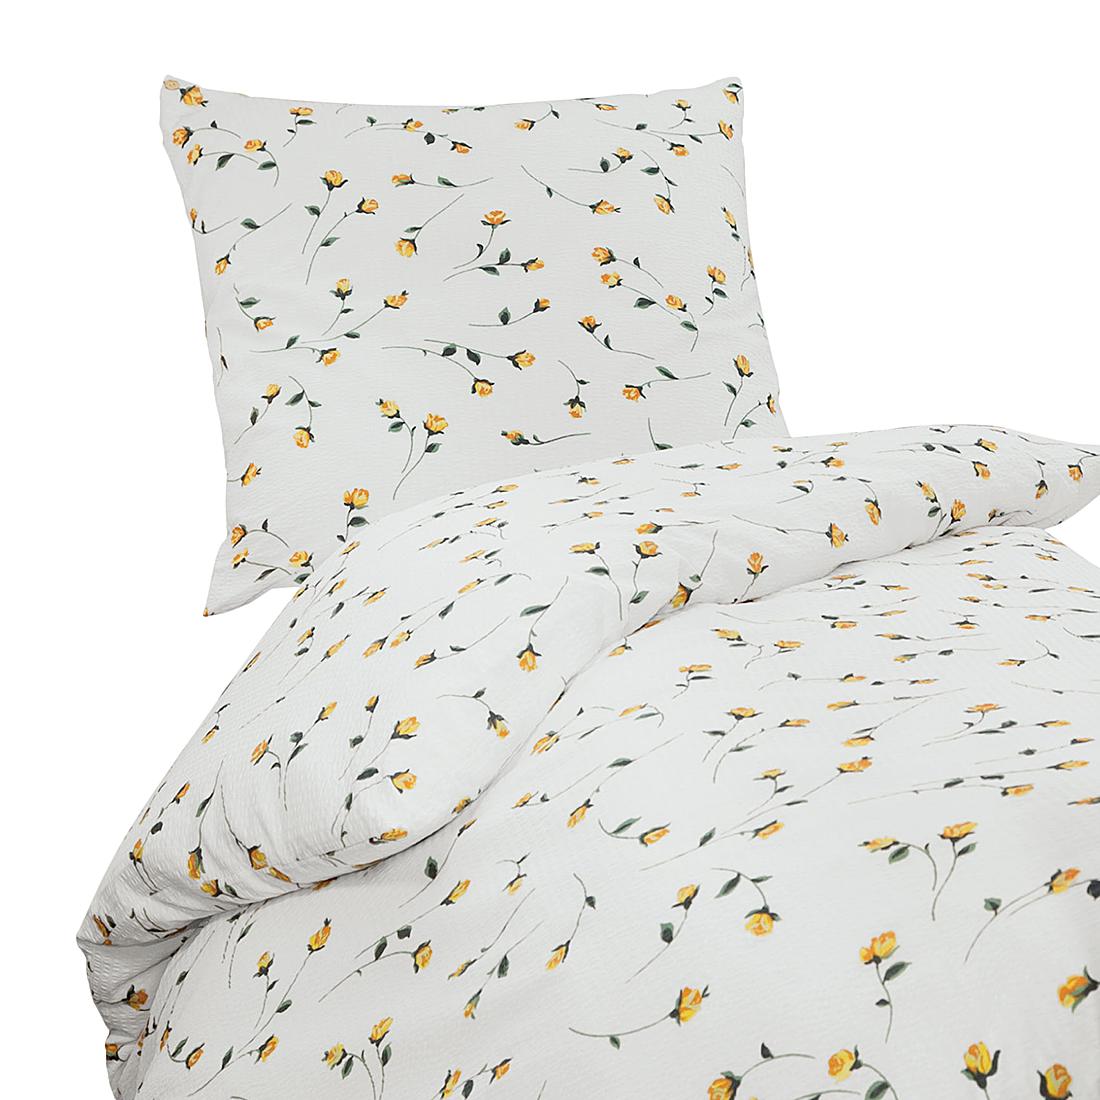 gelbe bettwsche cool kaeppel seersucker bettwsche uni x trkis terra gelb wei grn anthrazit. Black Bedroom Furniture Sets. Home Design Ideas